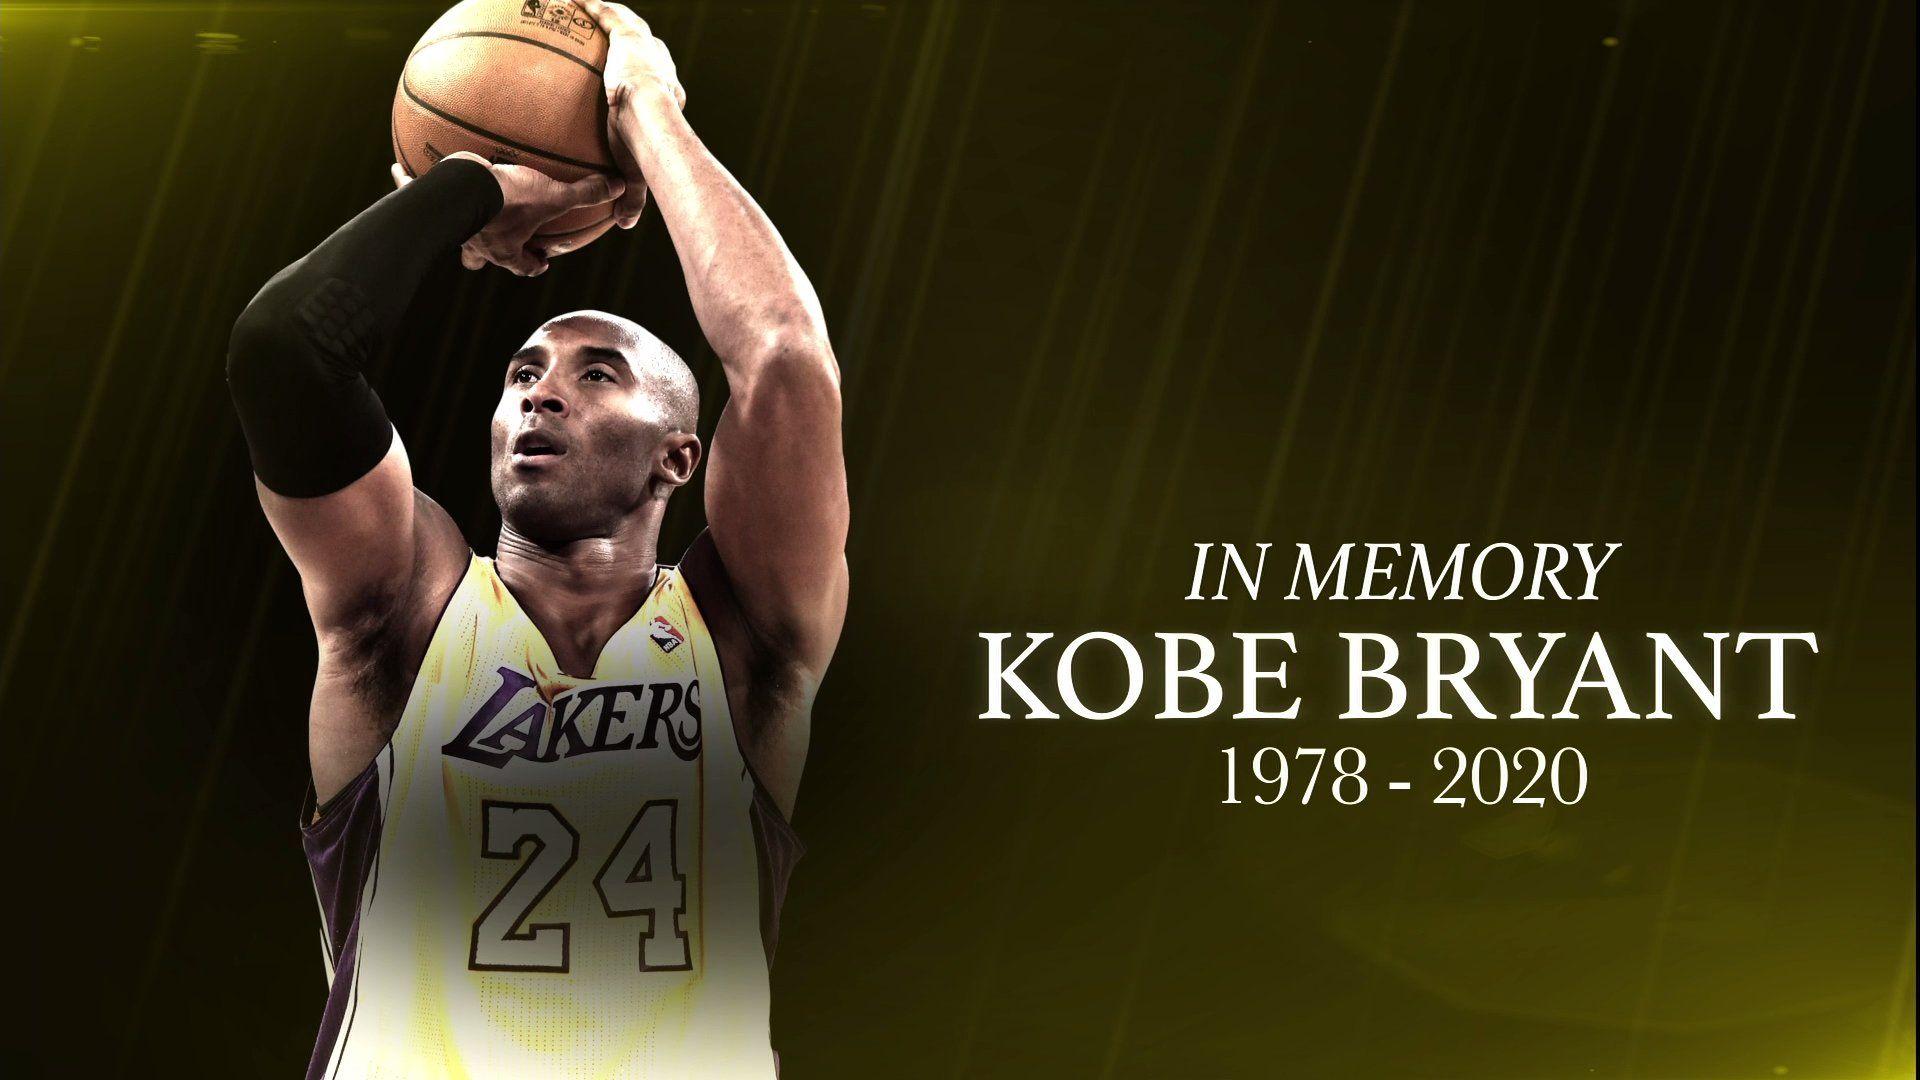 Rip Kobe Bryant Wallpapers   Top Rip Kobe Bryant Backgrounds 1920x1080